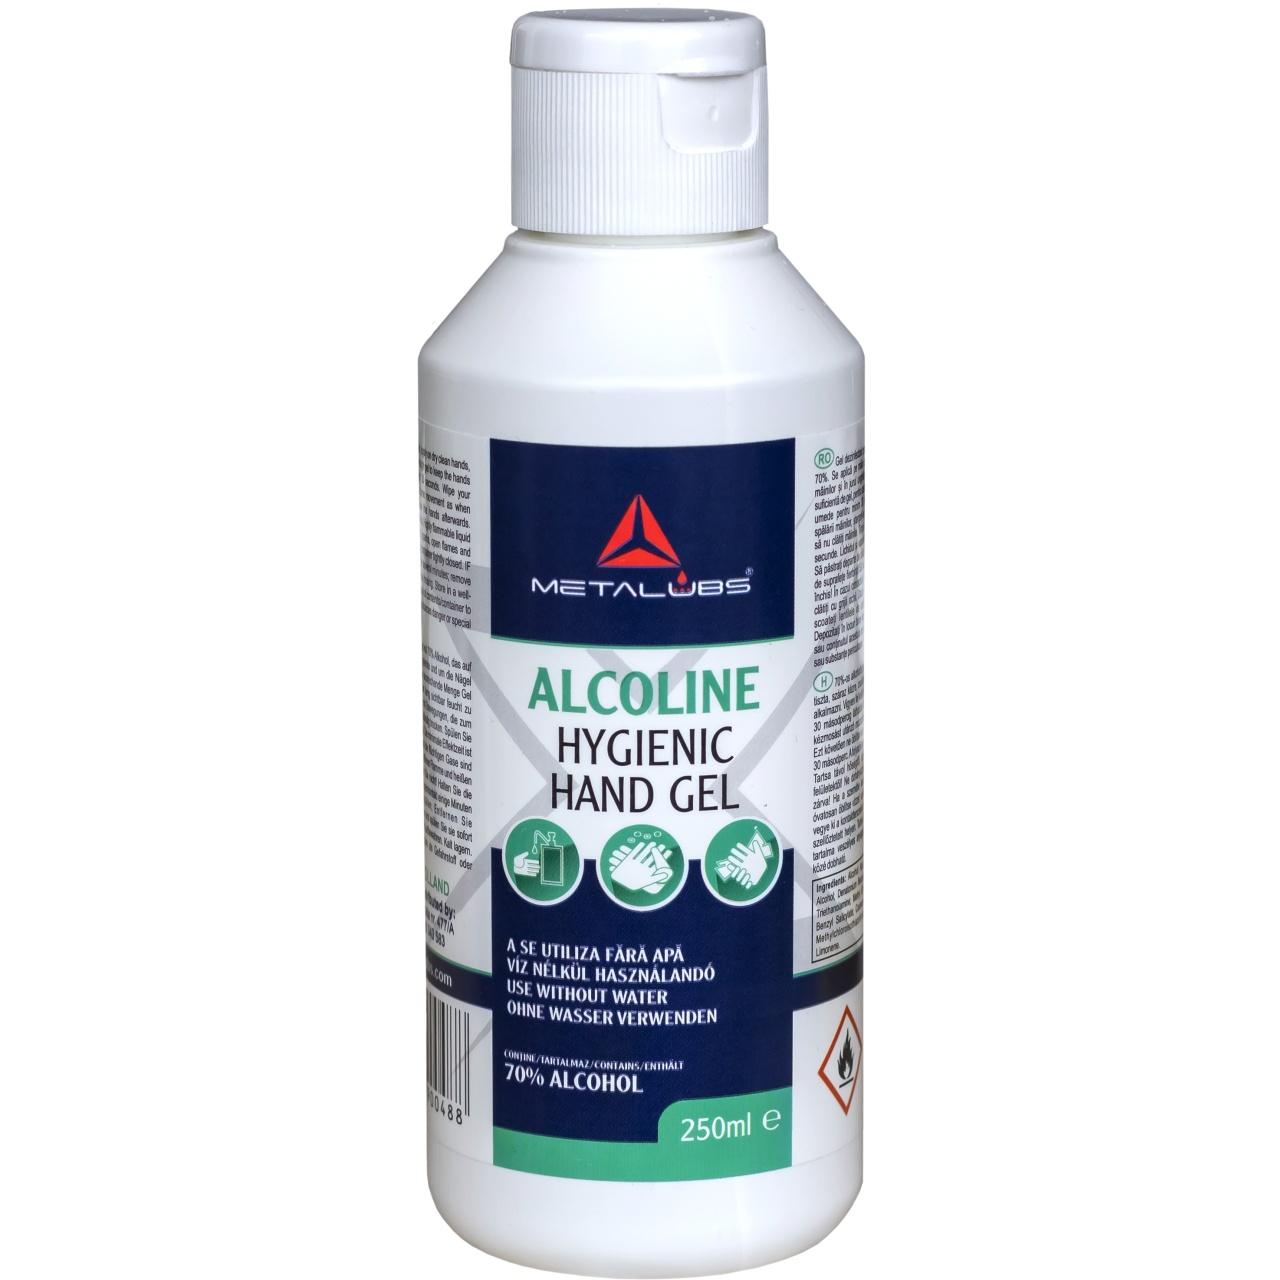 Metalubs Alcoline hygienic hand gel